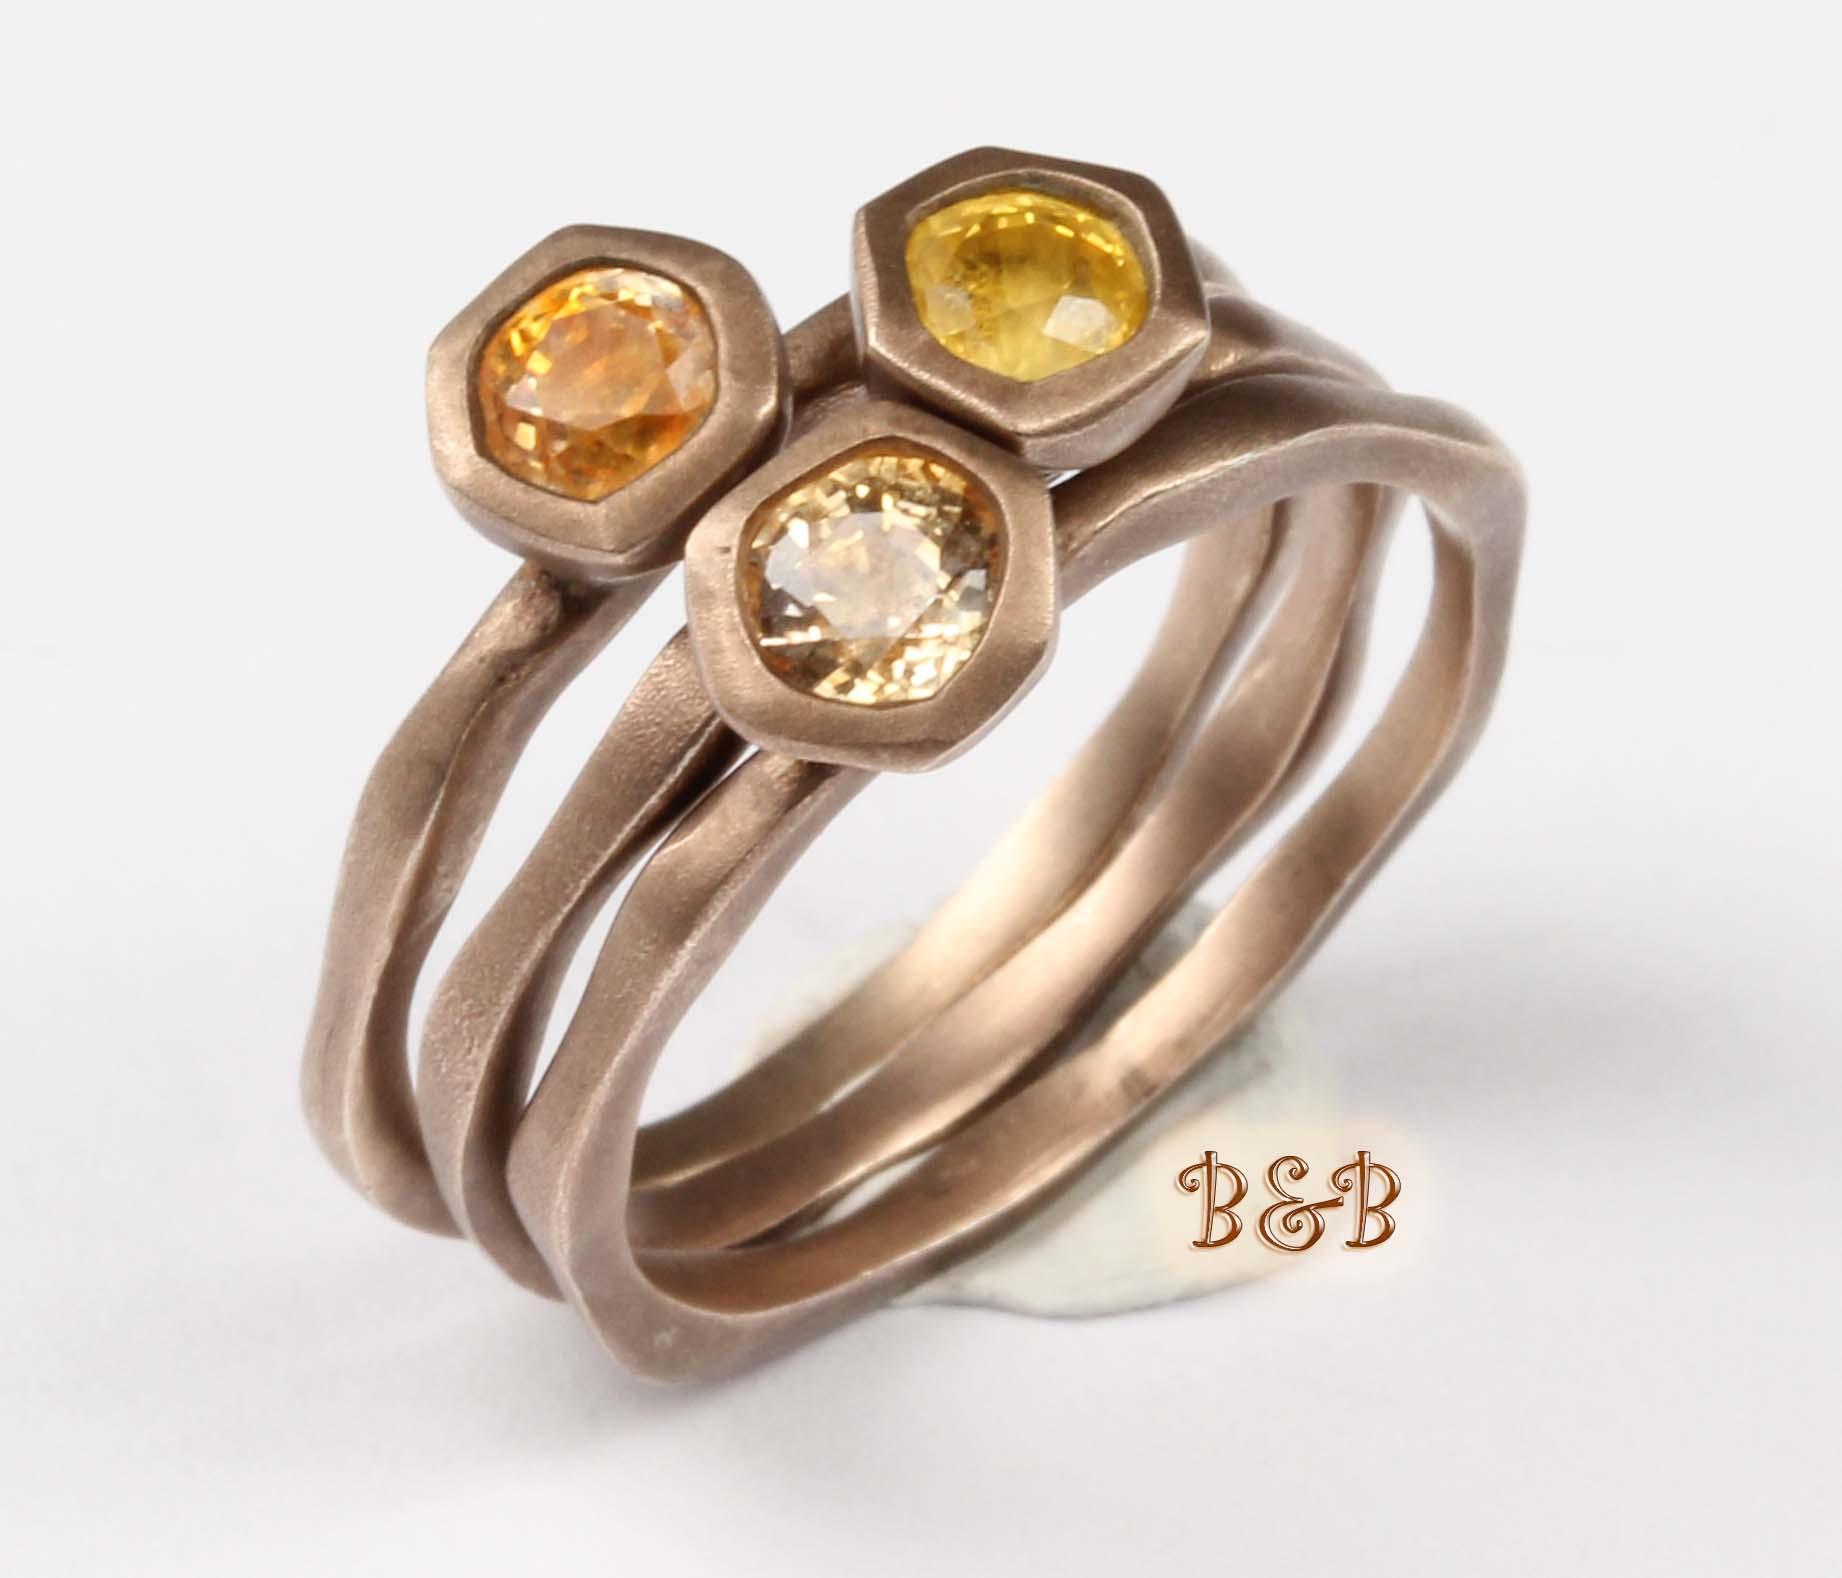 Silver ring_B&B_1667